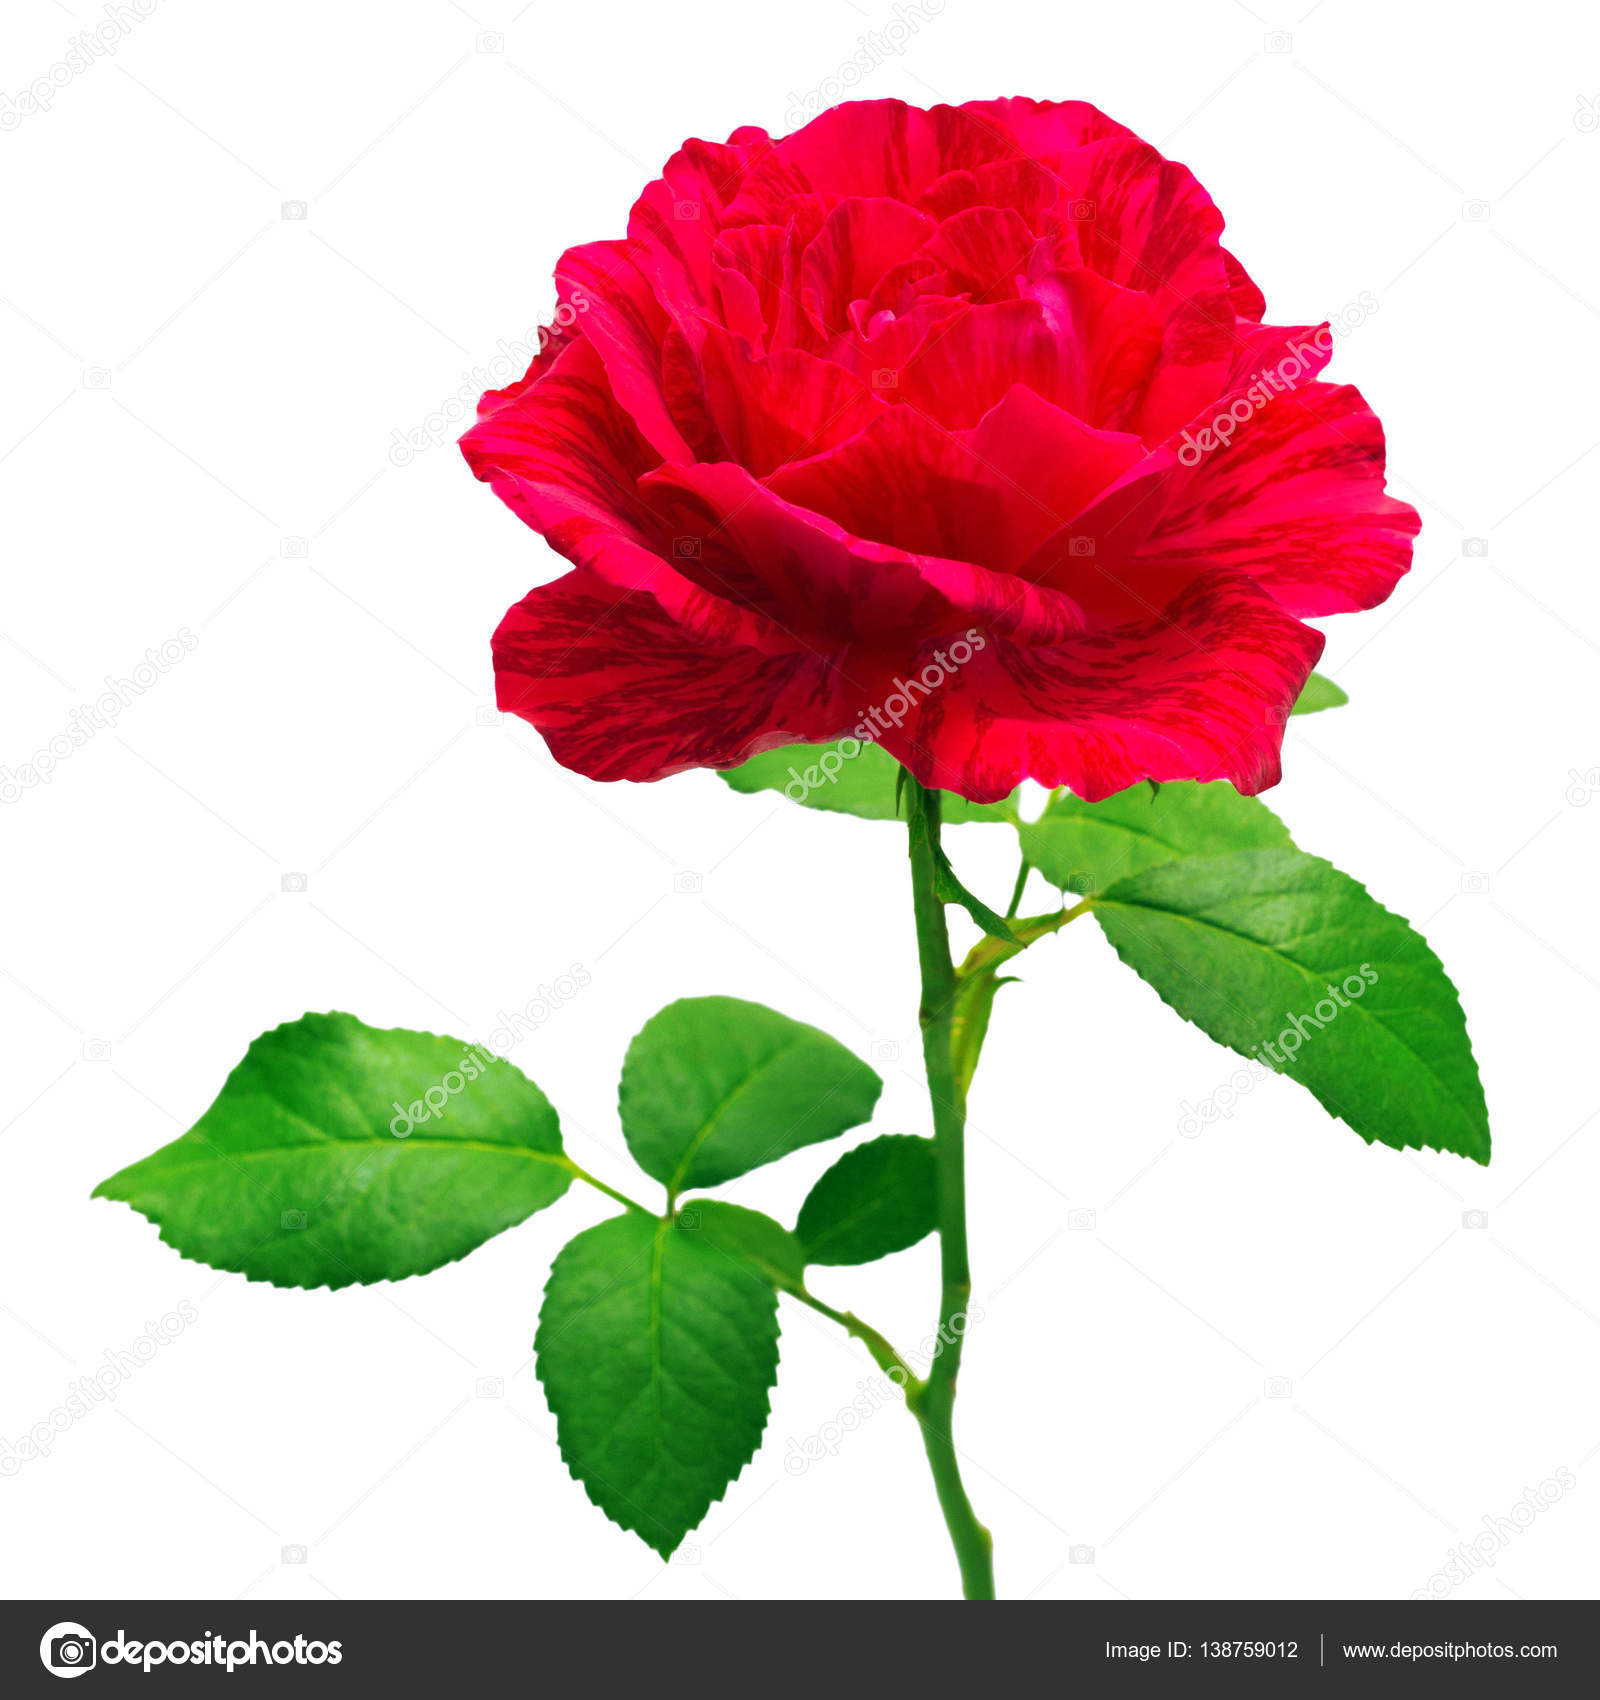 Rosa roja flor hermosa — Foto de Stock